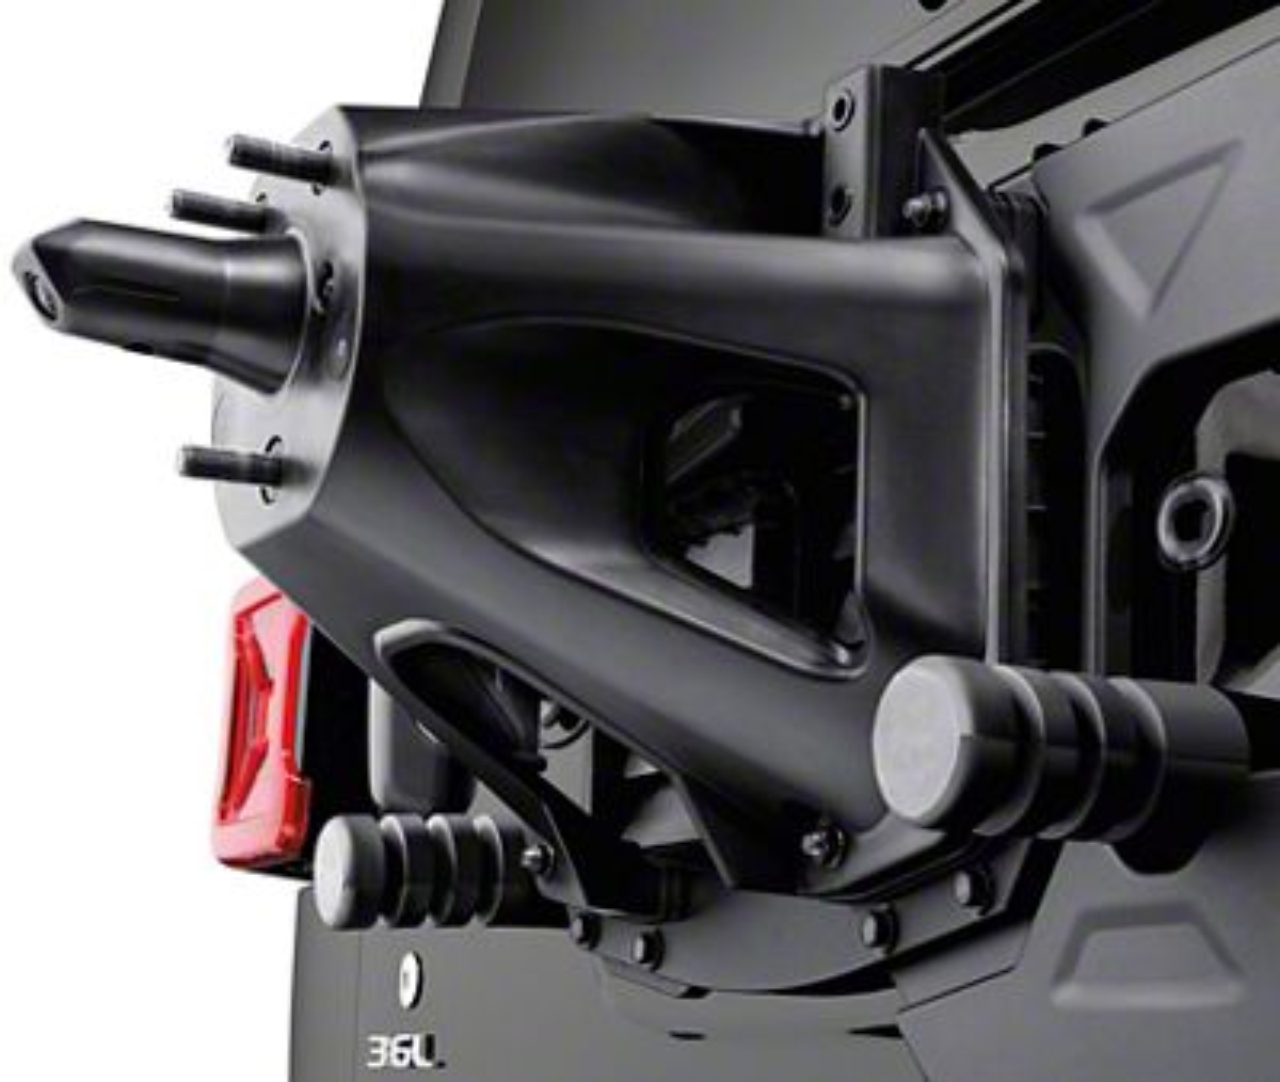 Mopar Oversize Spare Tire Carrier Mounting Bracket Kit (18-19 Jeep Wrangler JL)